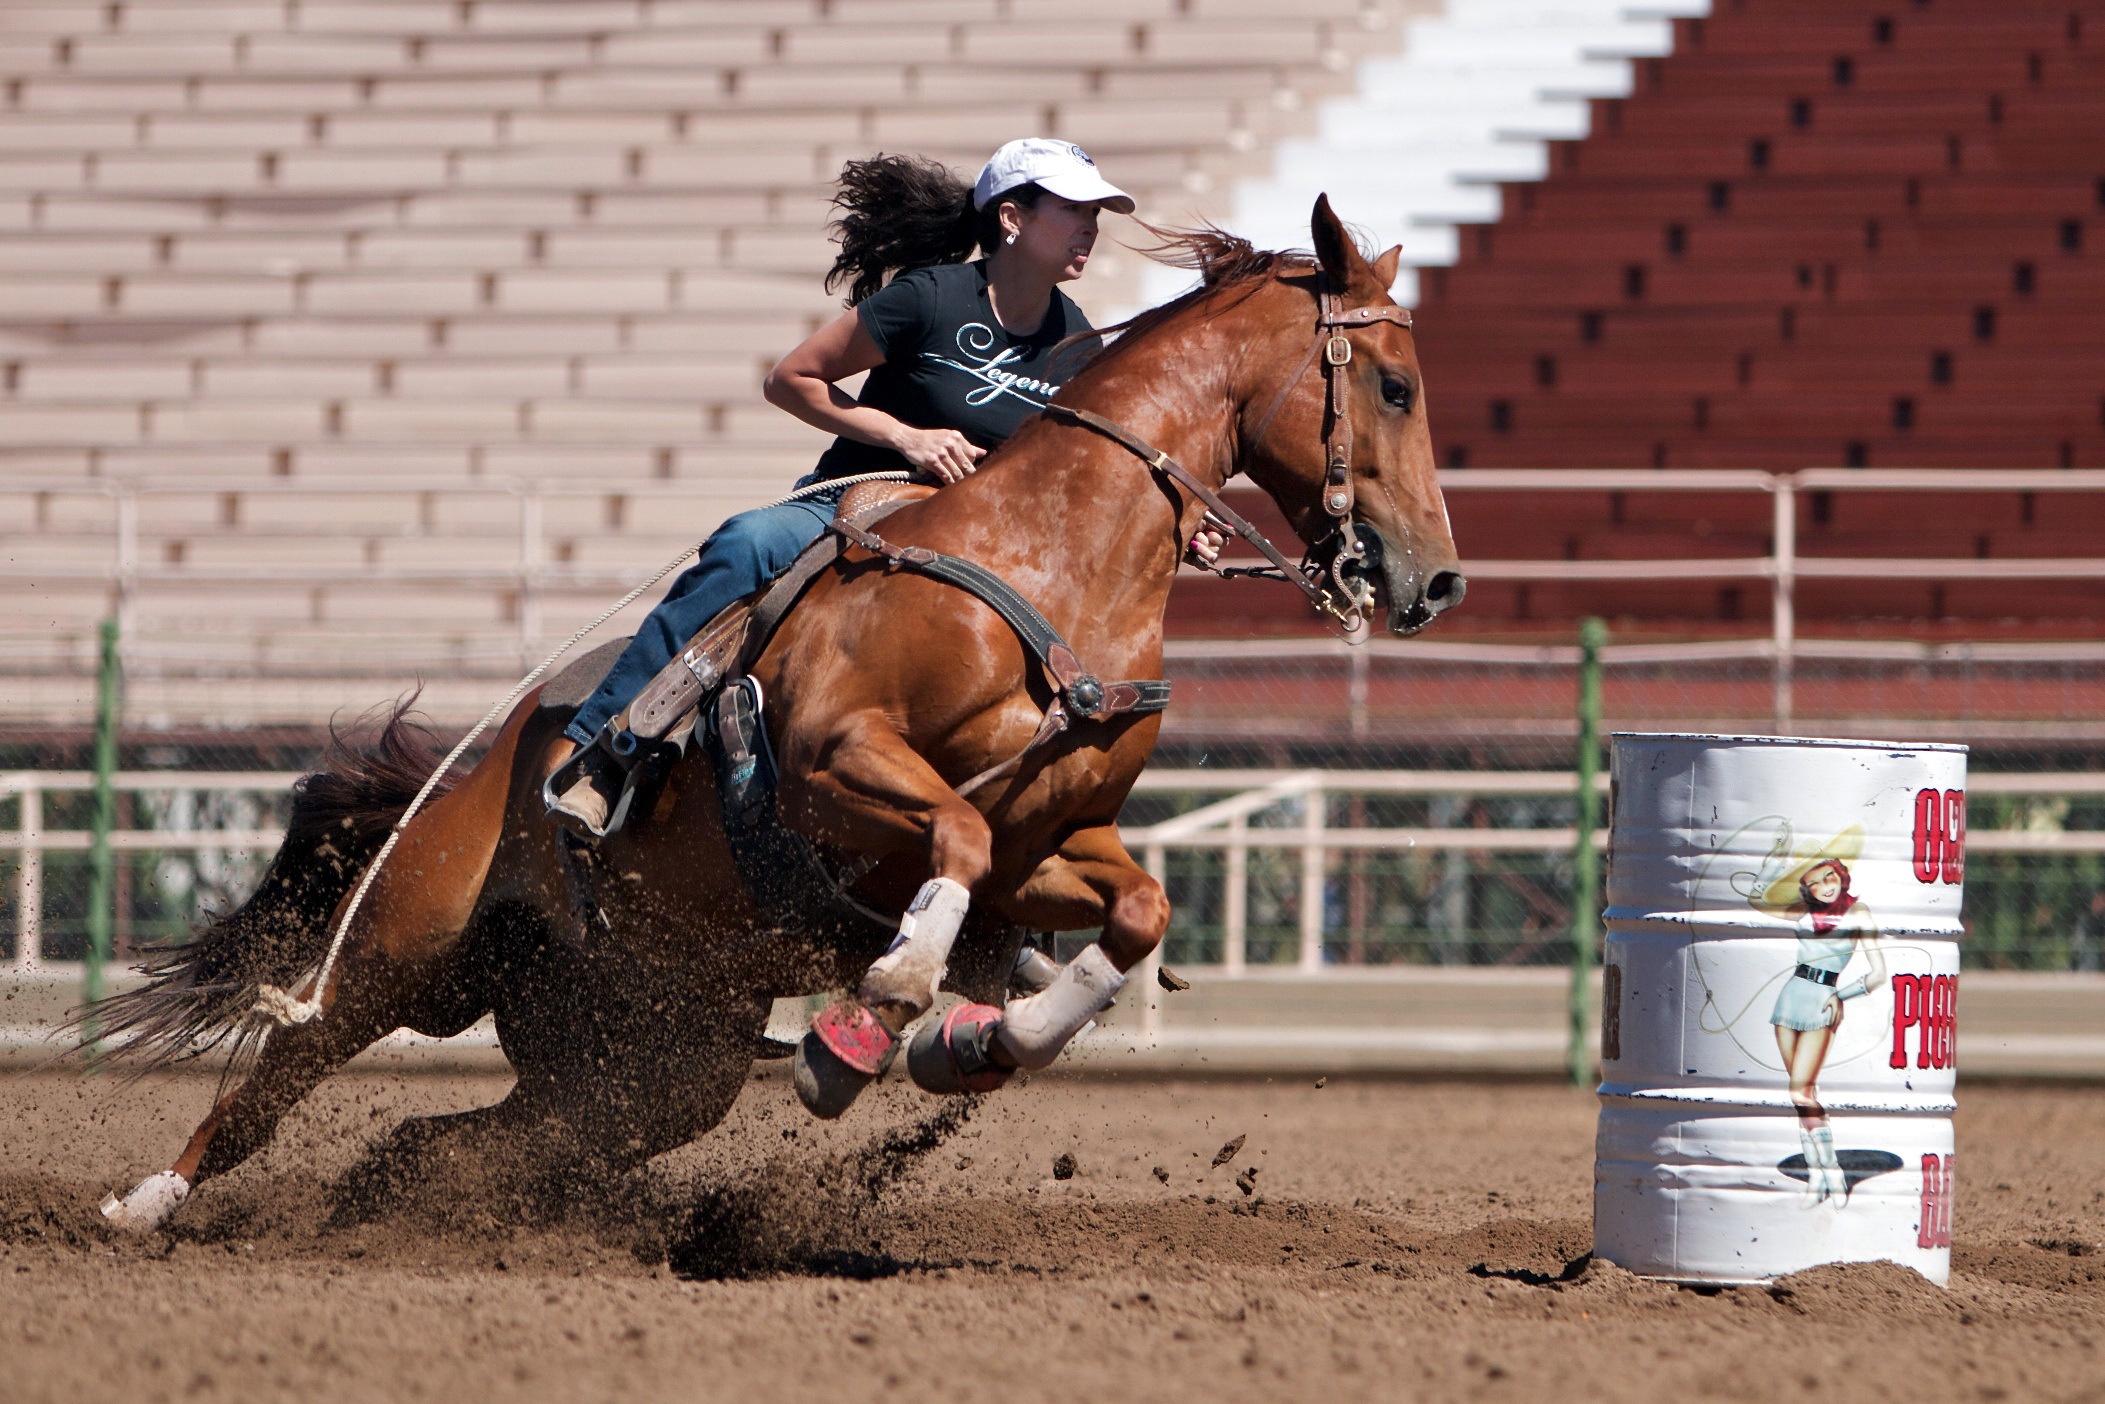 Конный спорт Спартакиада